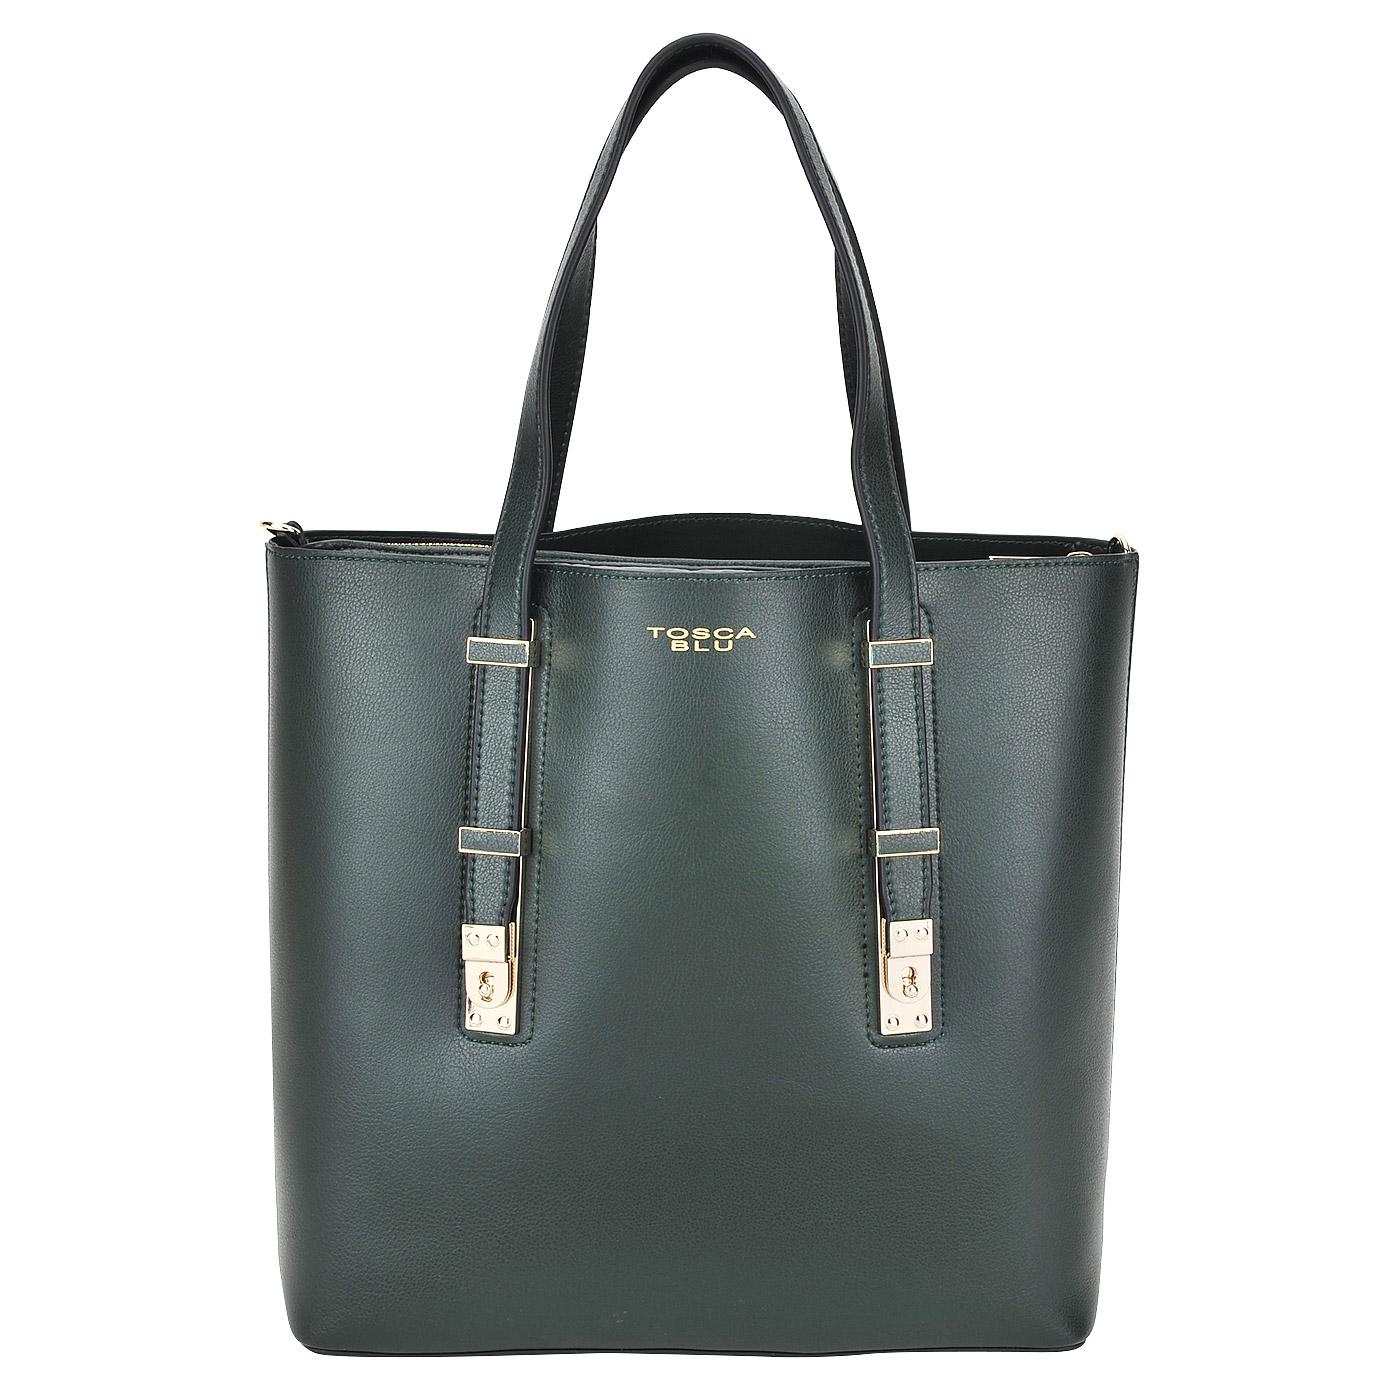 Женская сумка Tosca Blu Golden Tea 1625B11 green - 2000557607699 ... 48022131a74